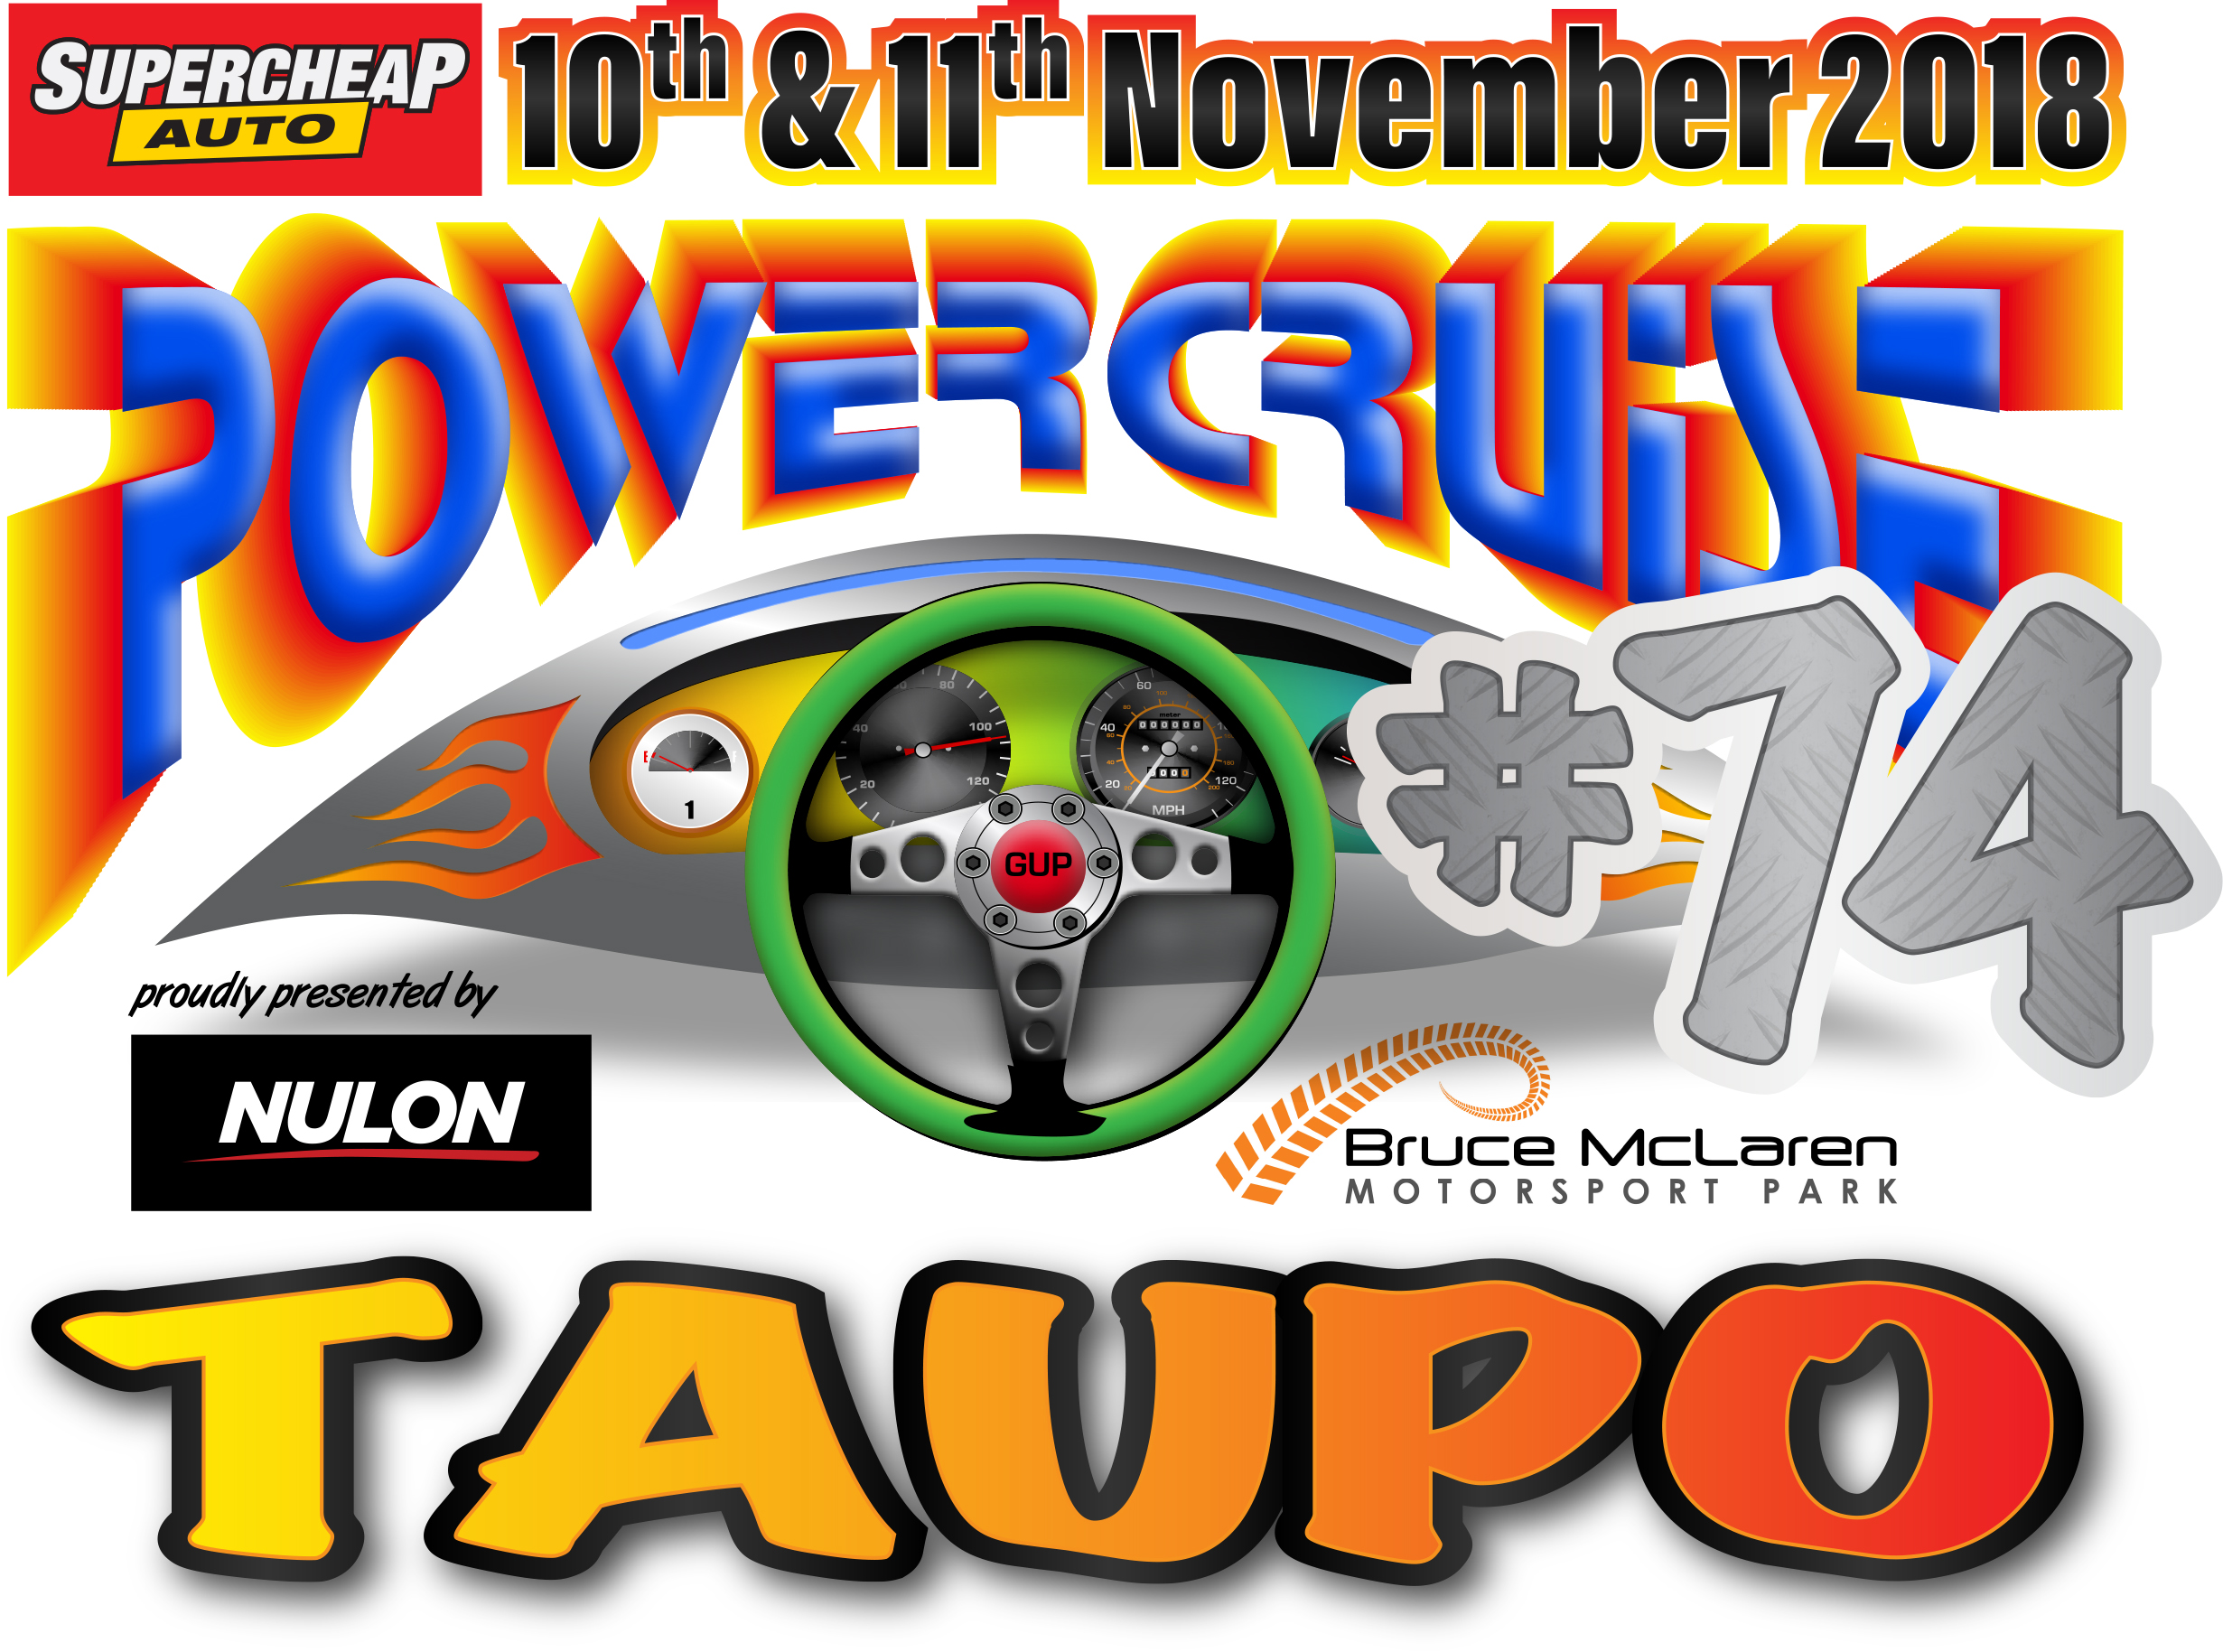 australia new zealand events calendar powercruise